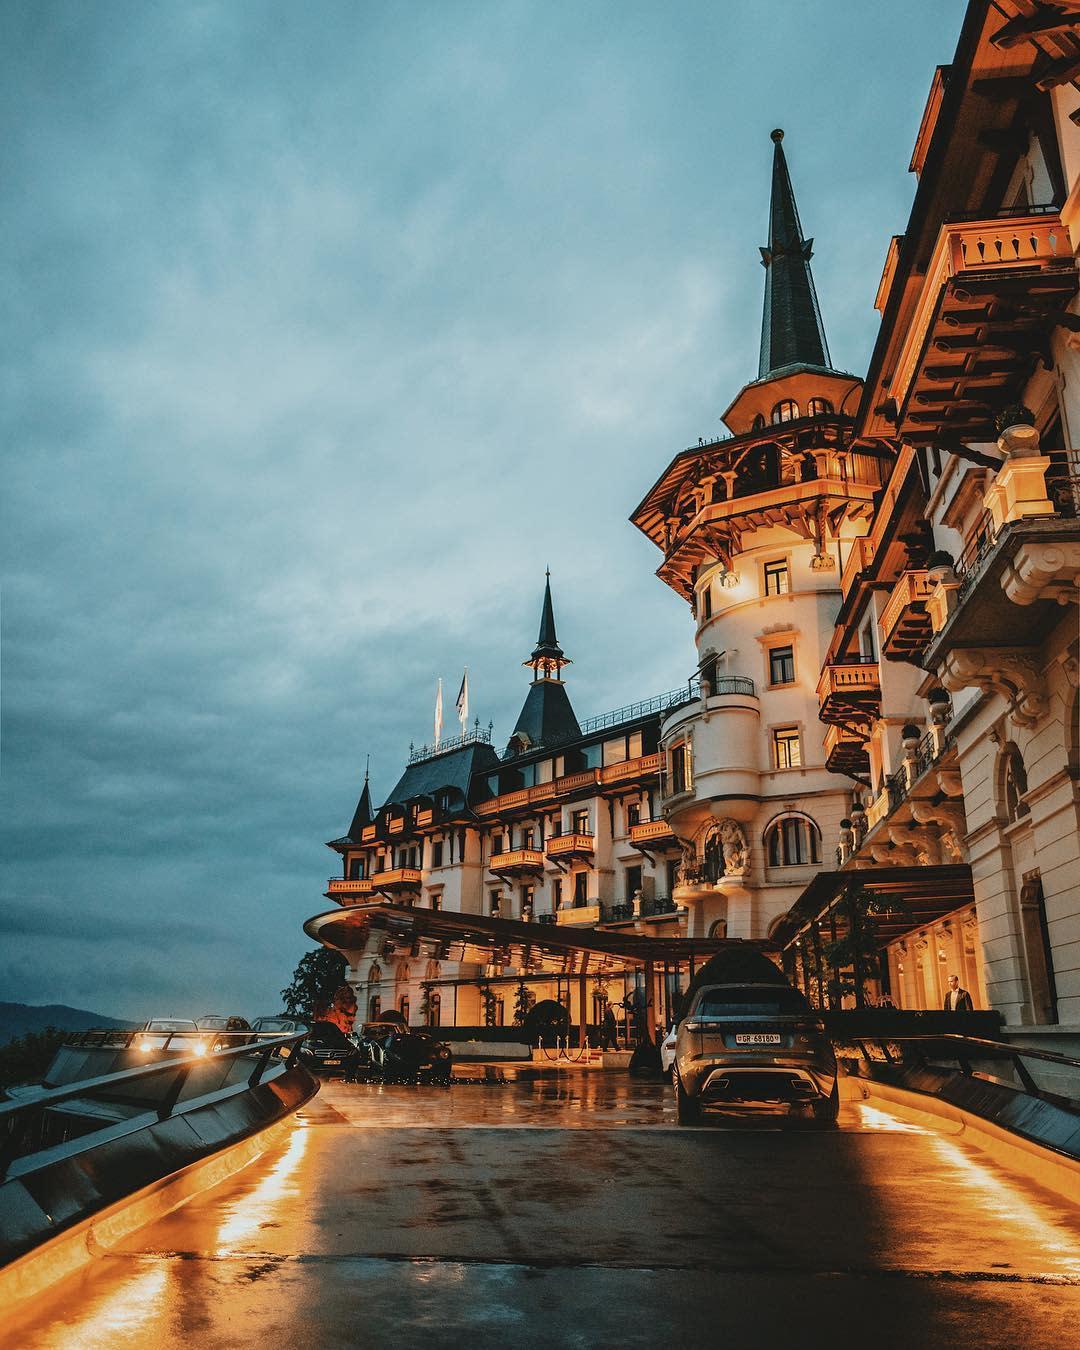 Swiss Alps 5-Star Hotel is Switzerland's First Luxury Hotel to Accept Bitcoin